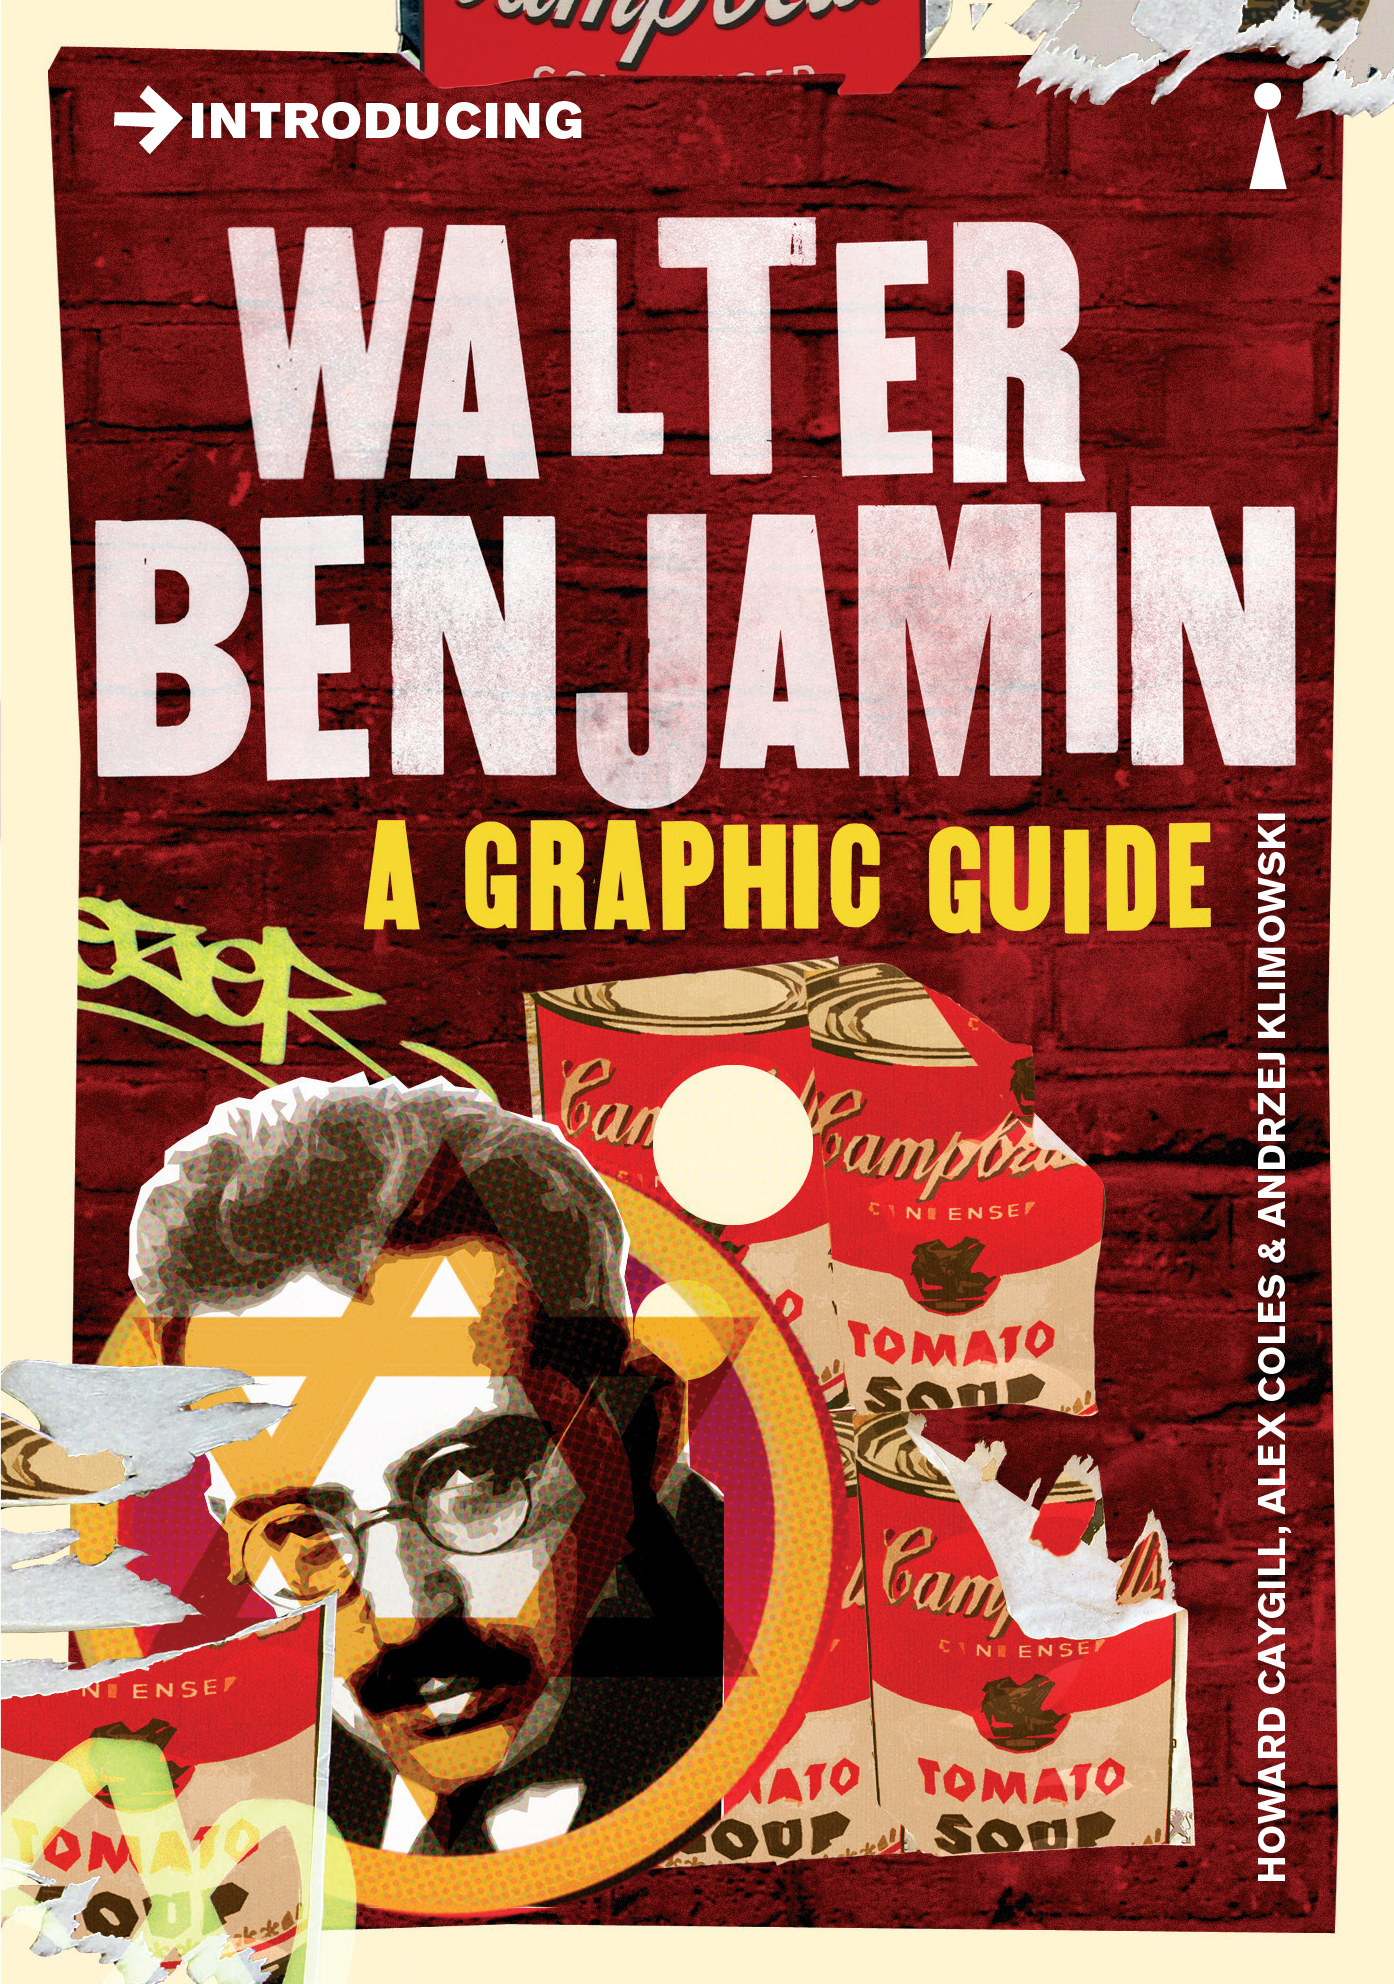 book washington diplomacy profiles of people of world influence 2002